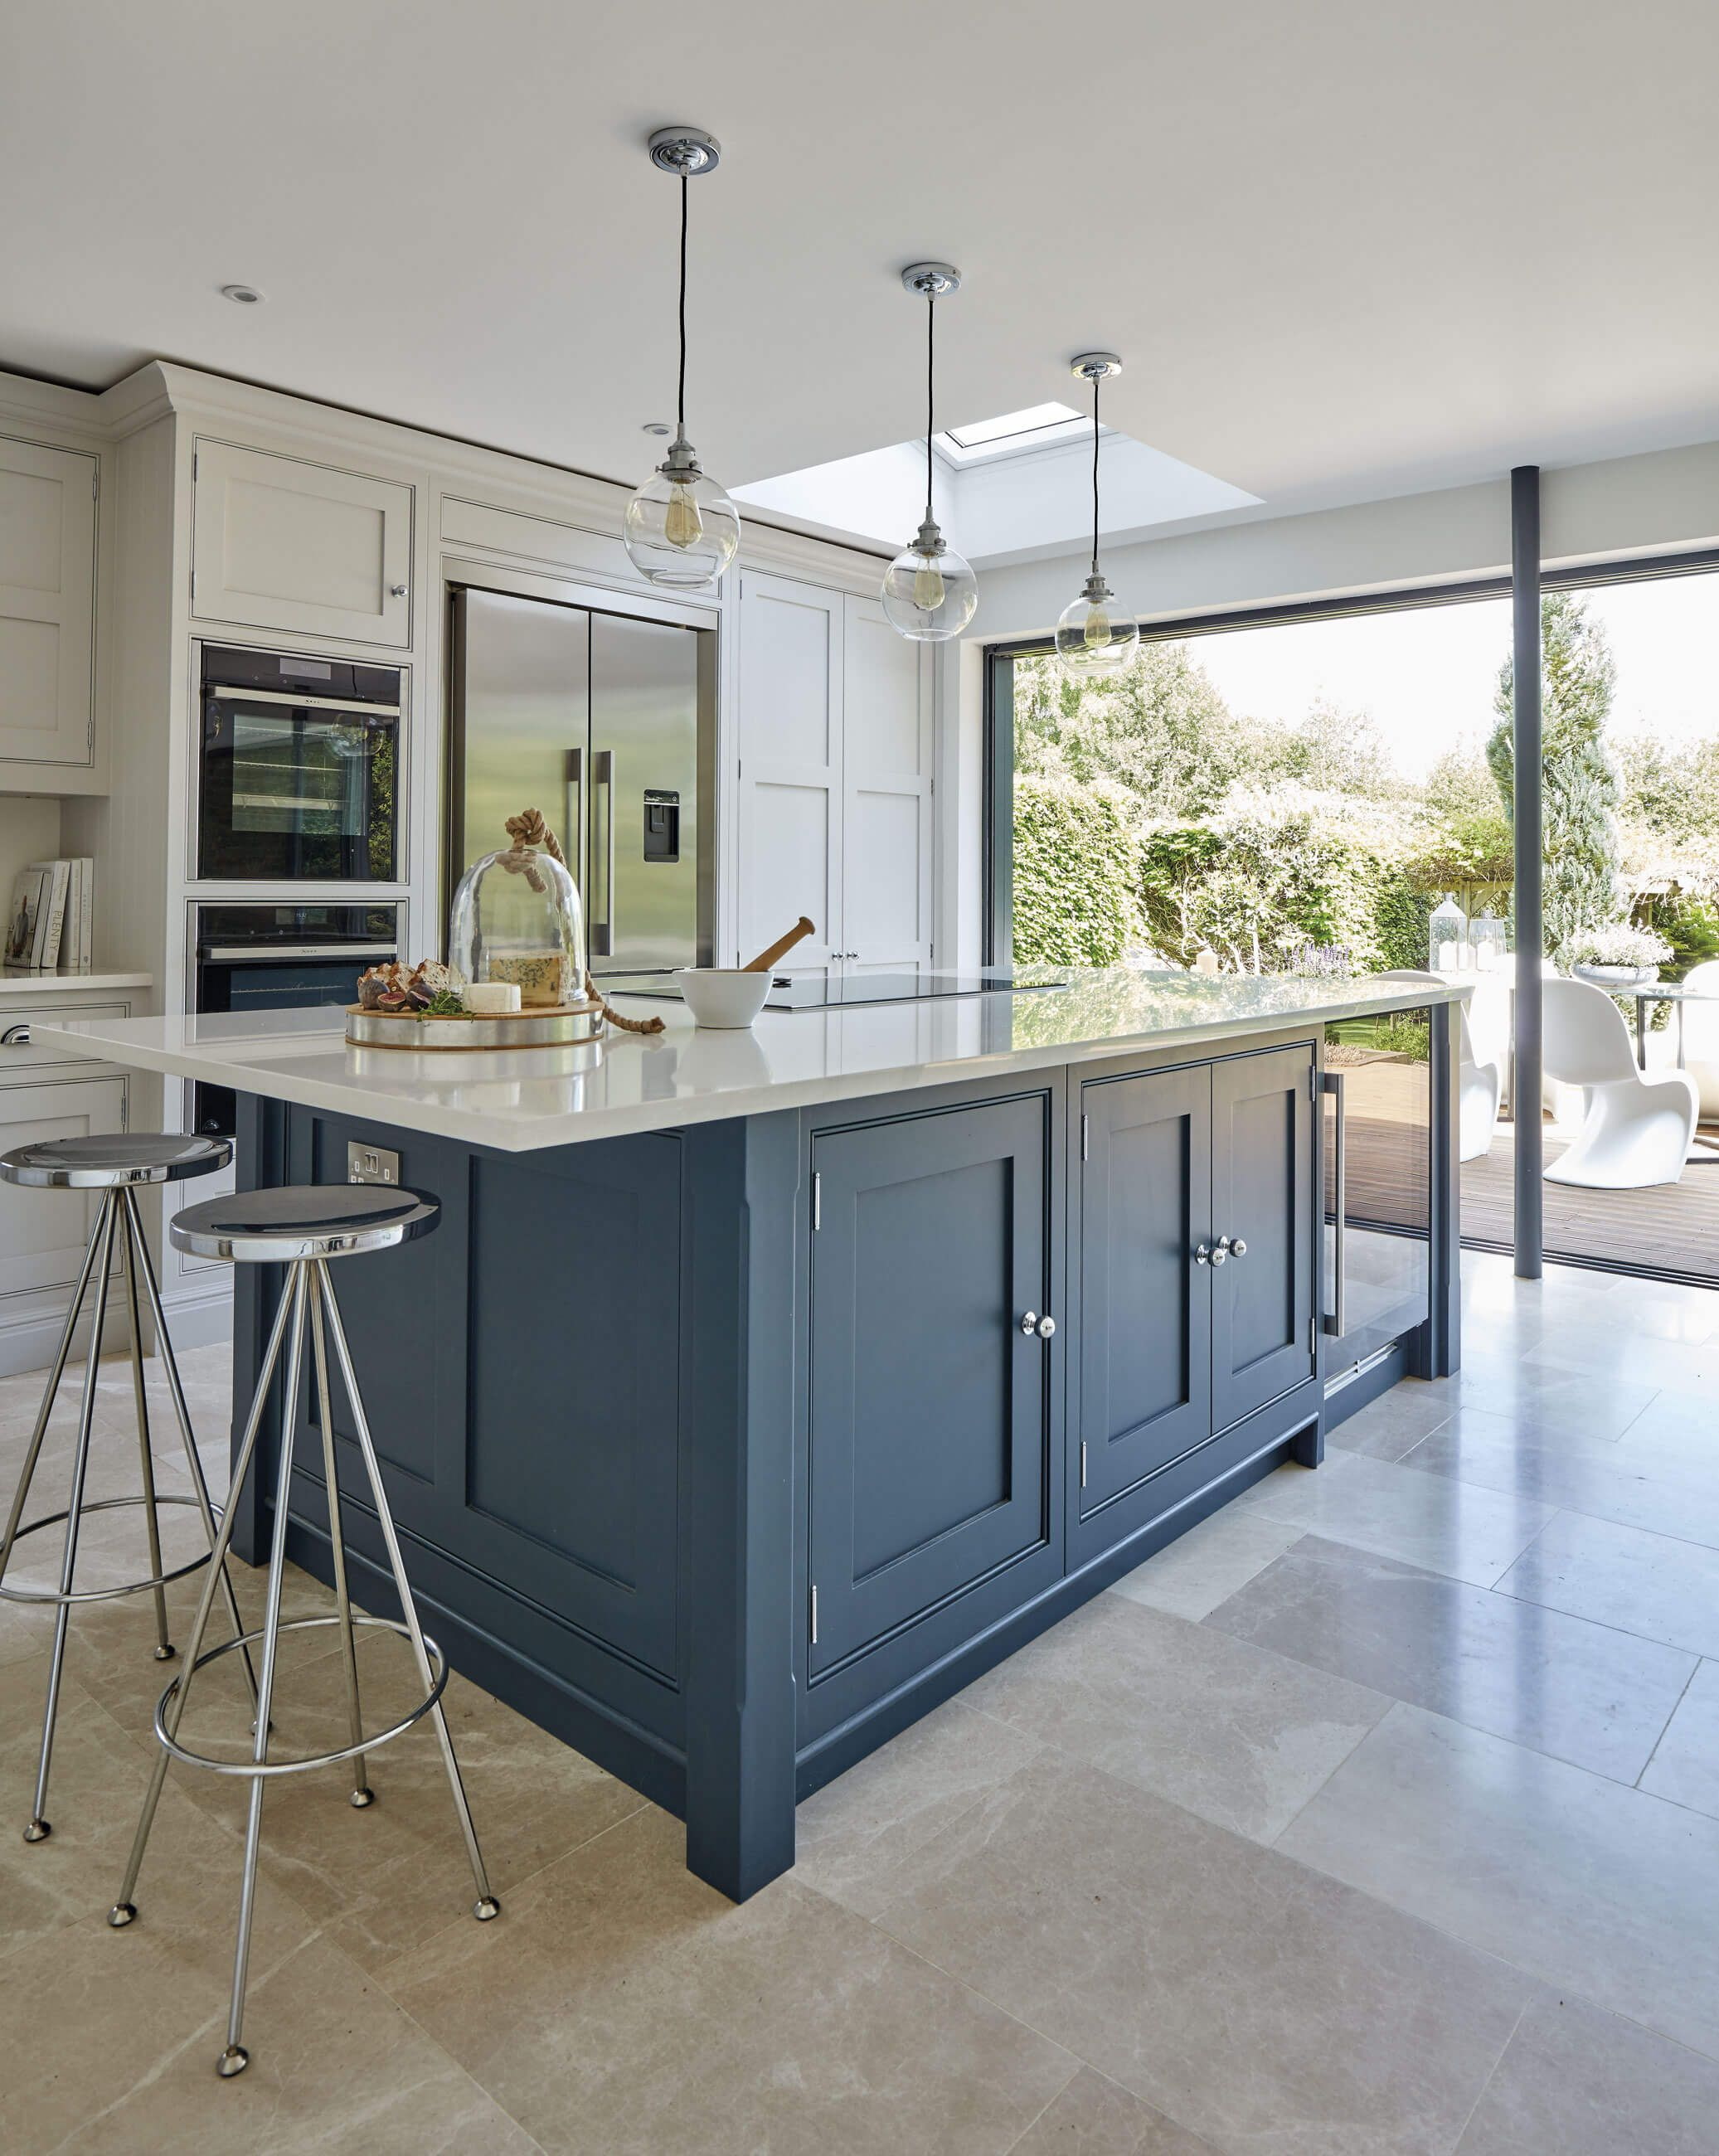 Kitchen Island Bespoke Kitchen Cabinets Tom Howley Interior Design Kitchen Blue Shaker Kitchen Dream Kitchens Design